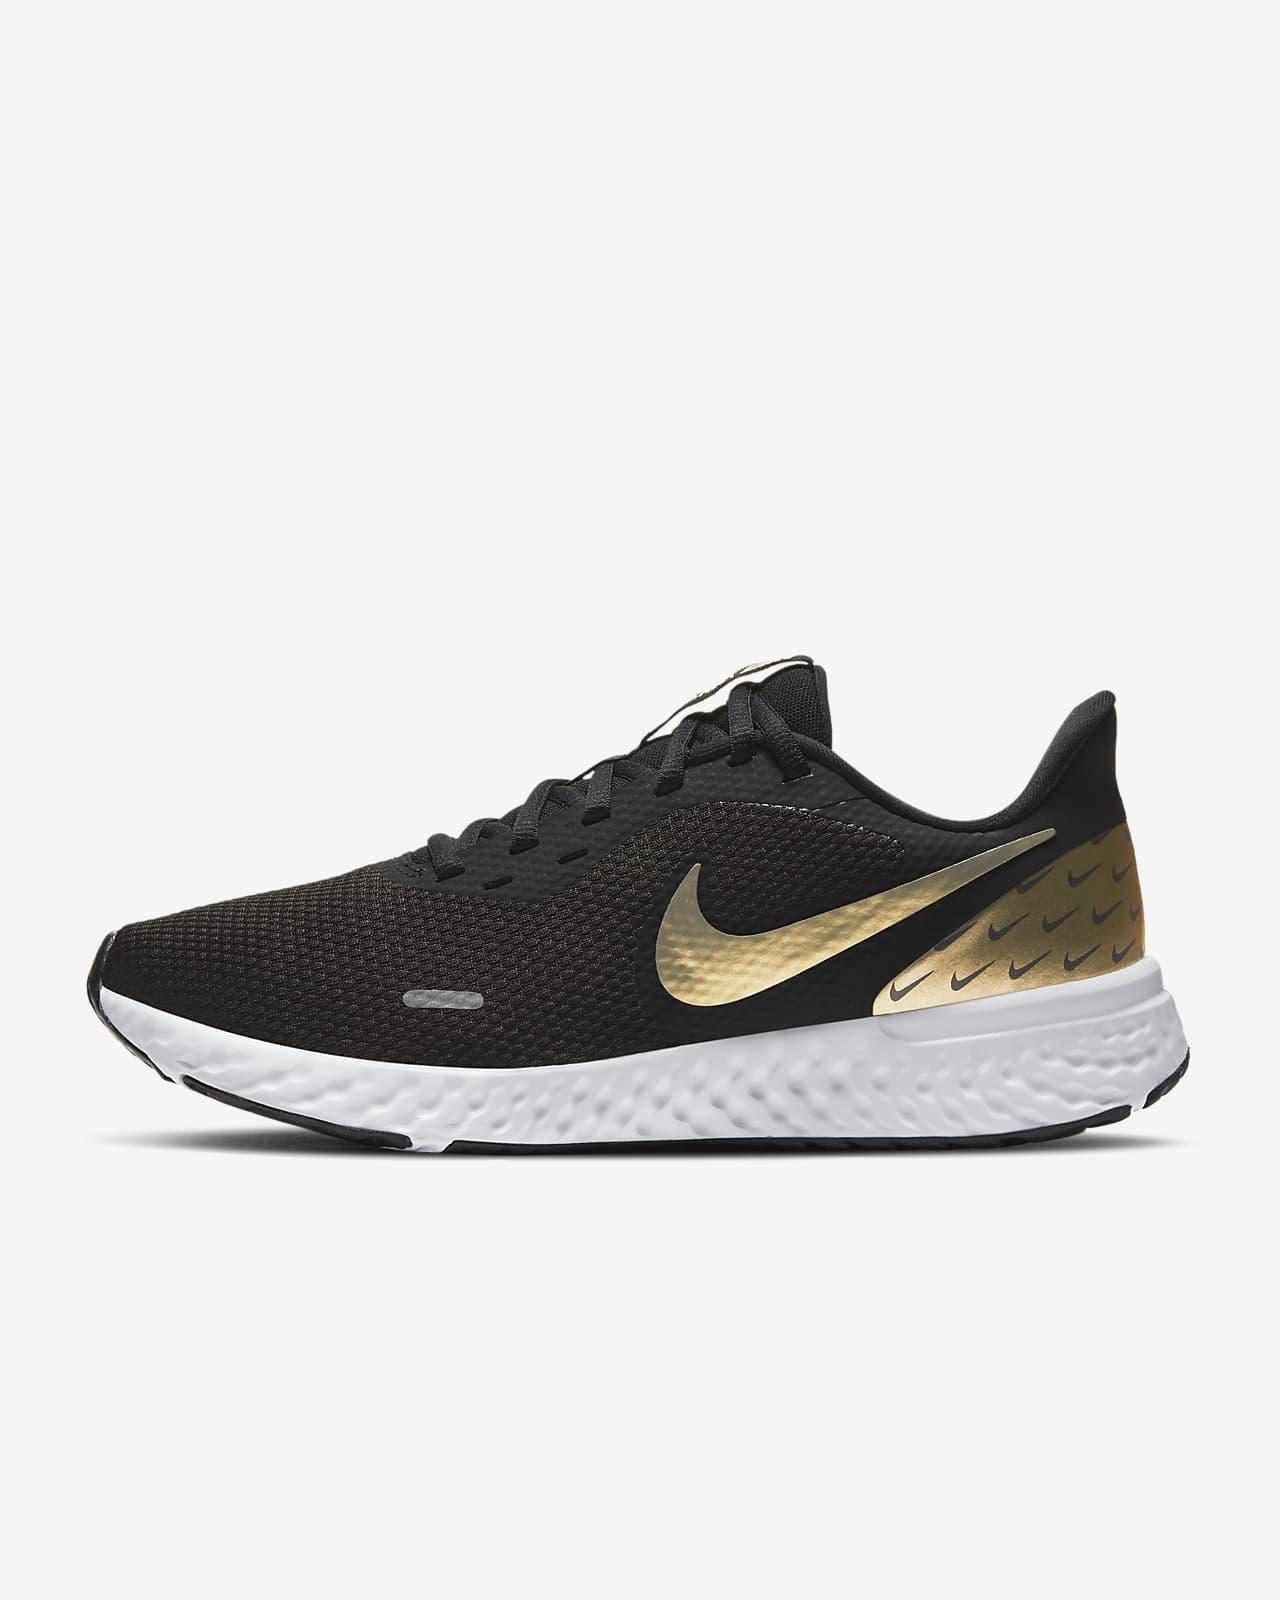 Chaussure de running Nike Revolution 5 Premium pour Femme